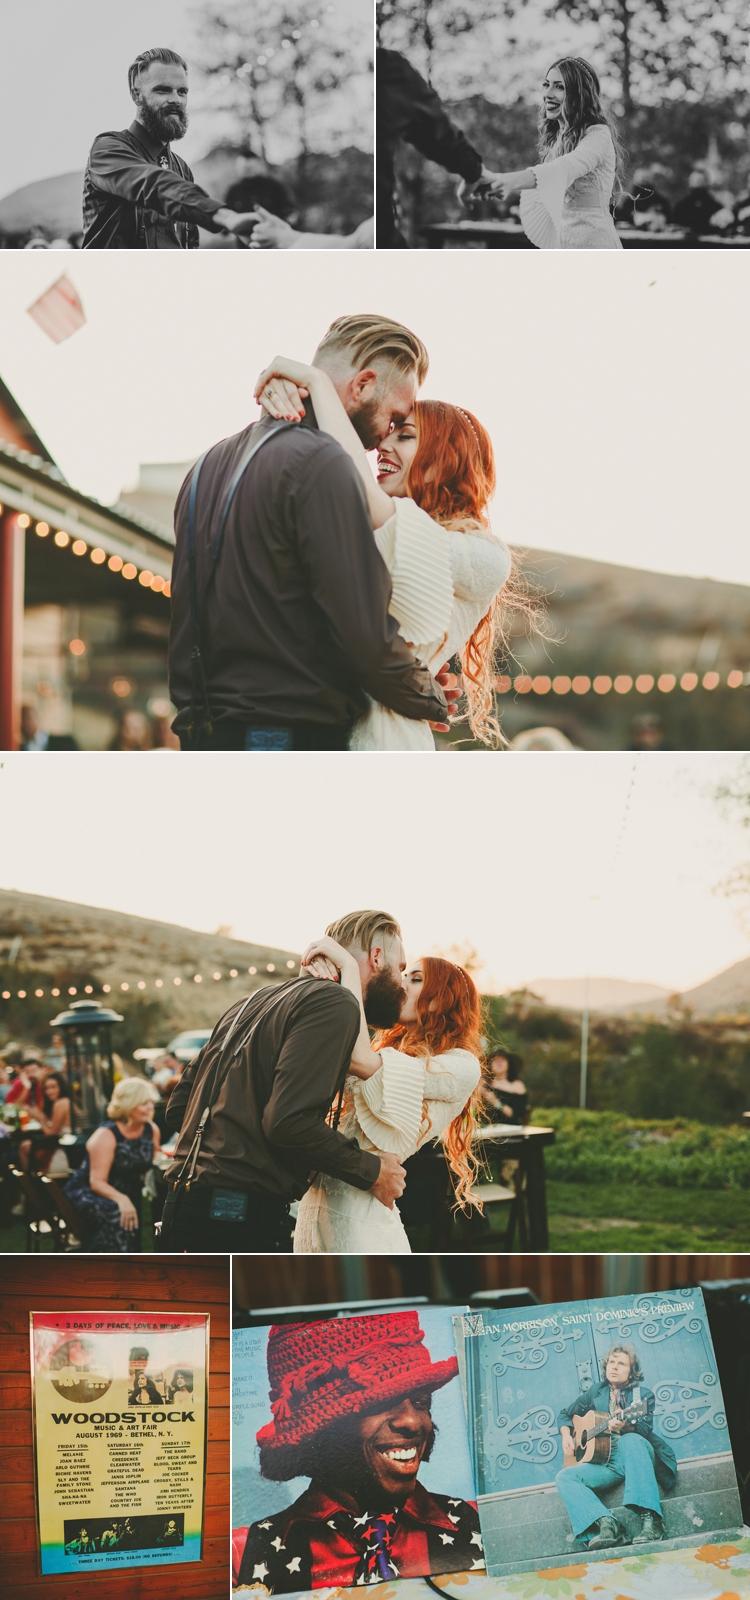 woodstock-inspired-wedding-photos-30